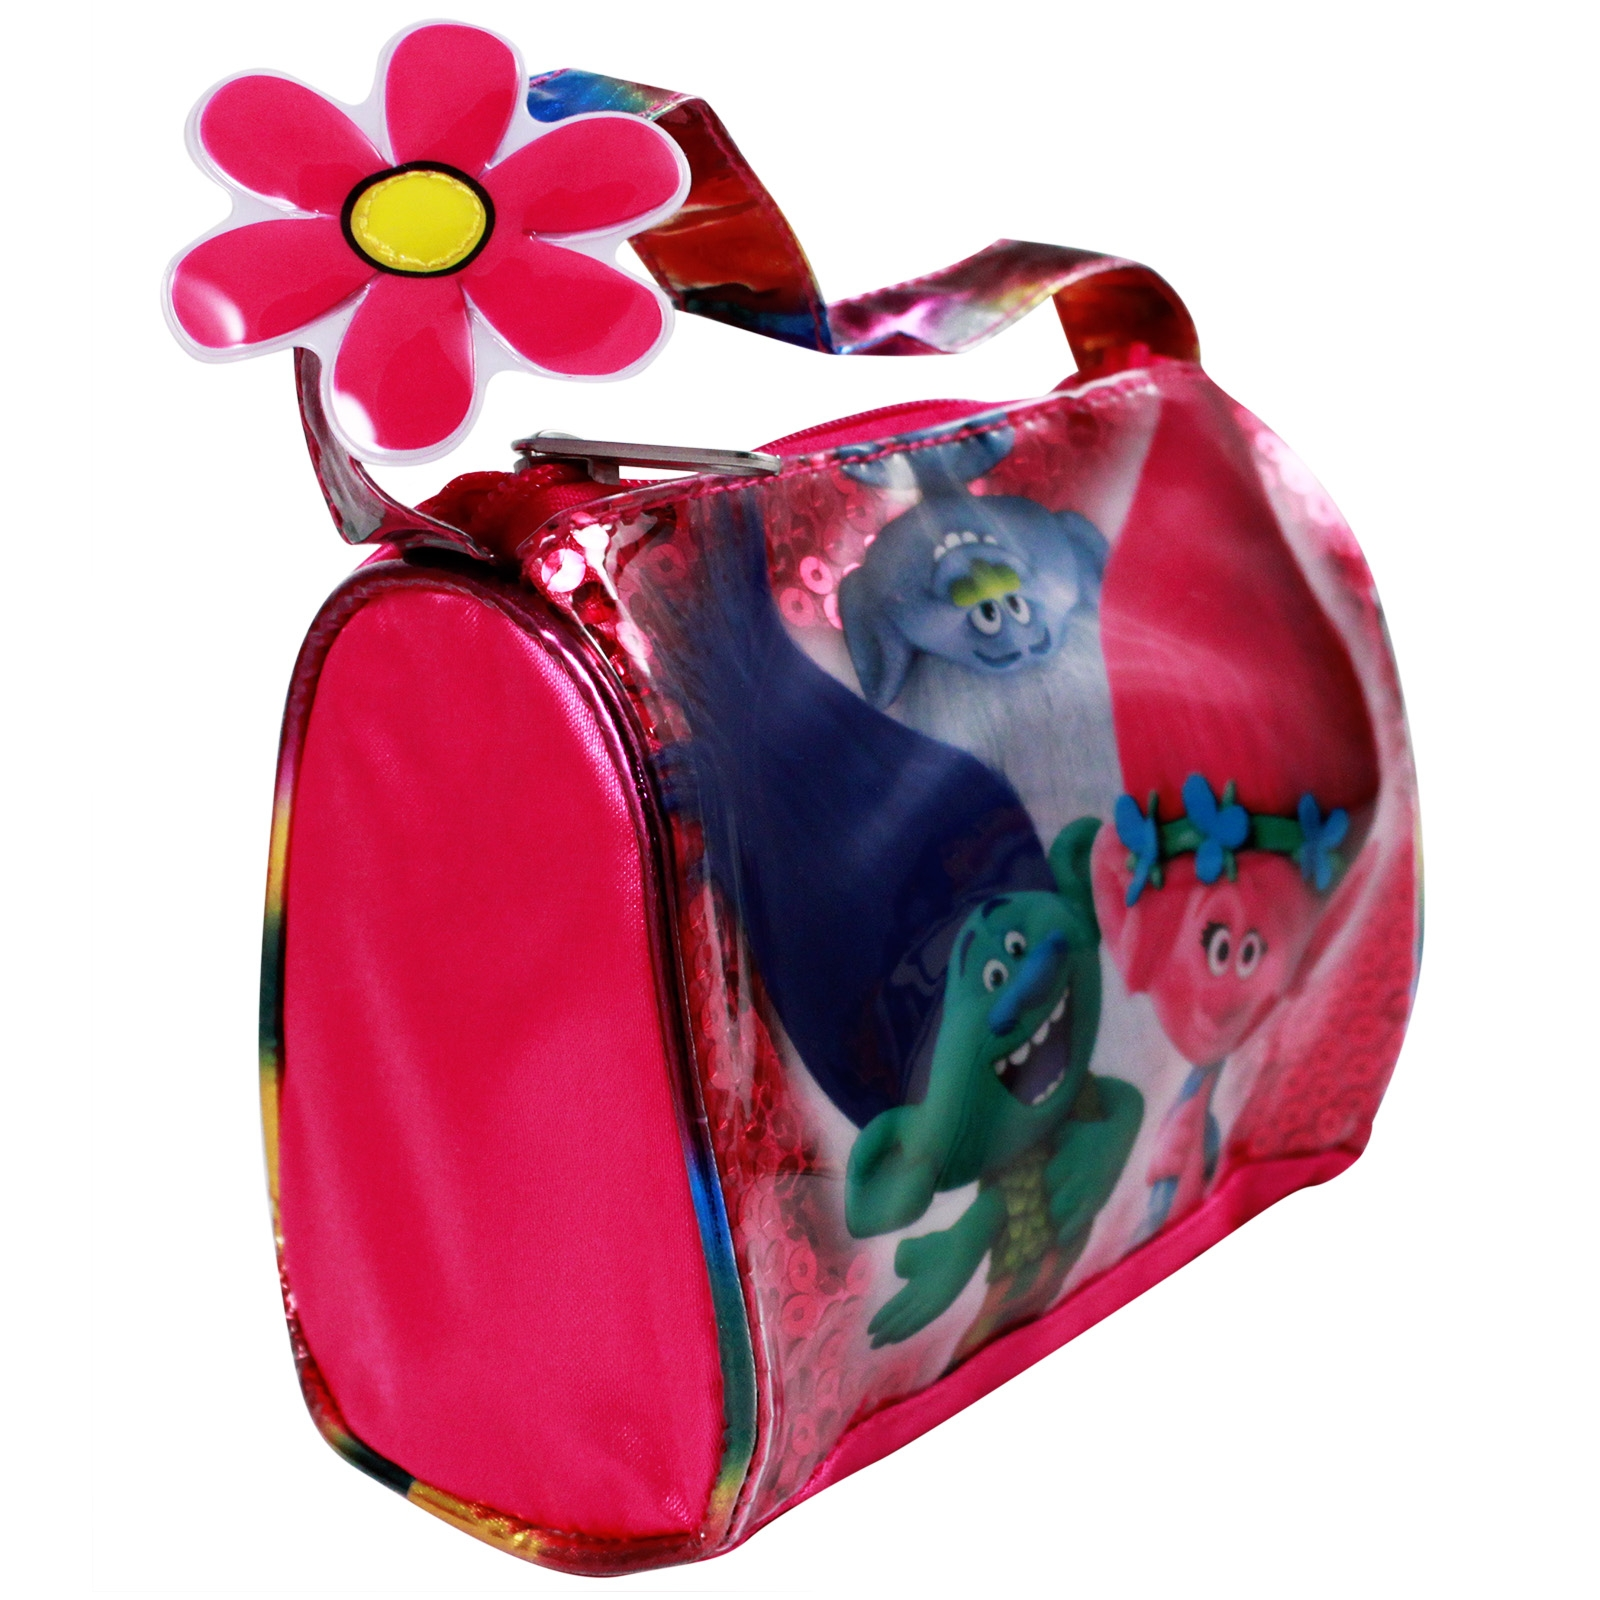 Dreamworks Trolls Satin Handbag Girls Dress Up Purse Featuring Poppy, Branch, and Guy Diamond